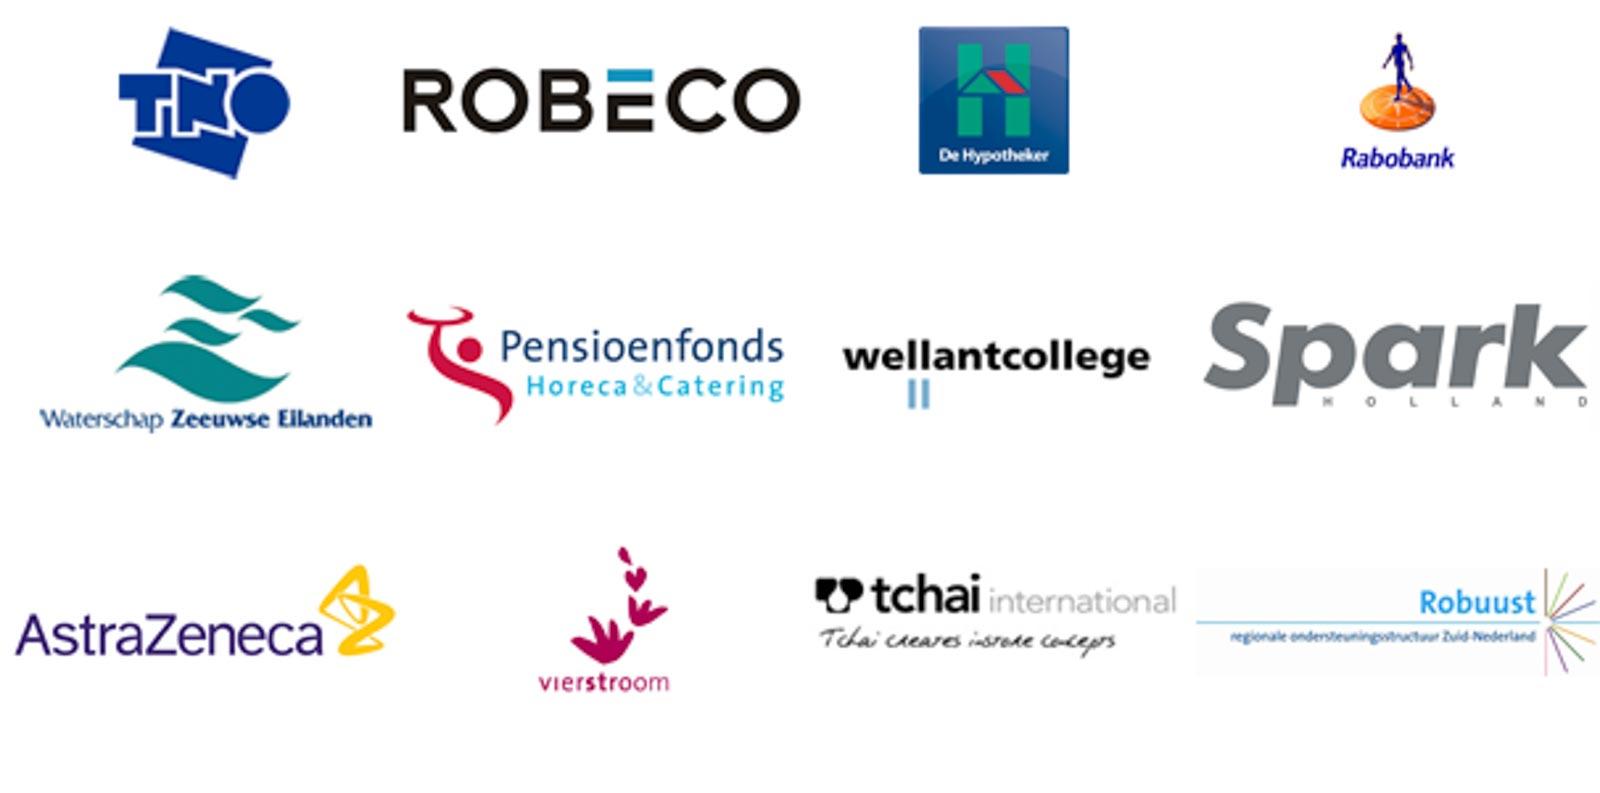 Verzameling logo's bedrijfsuitjes fotografie